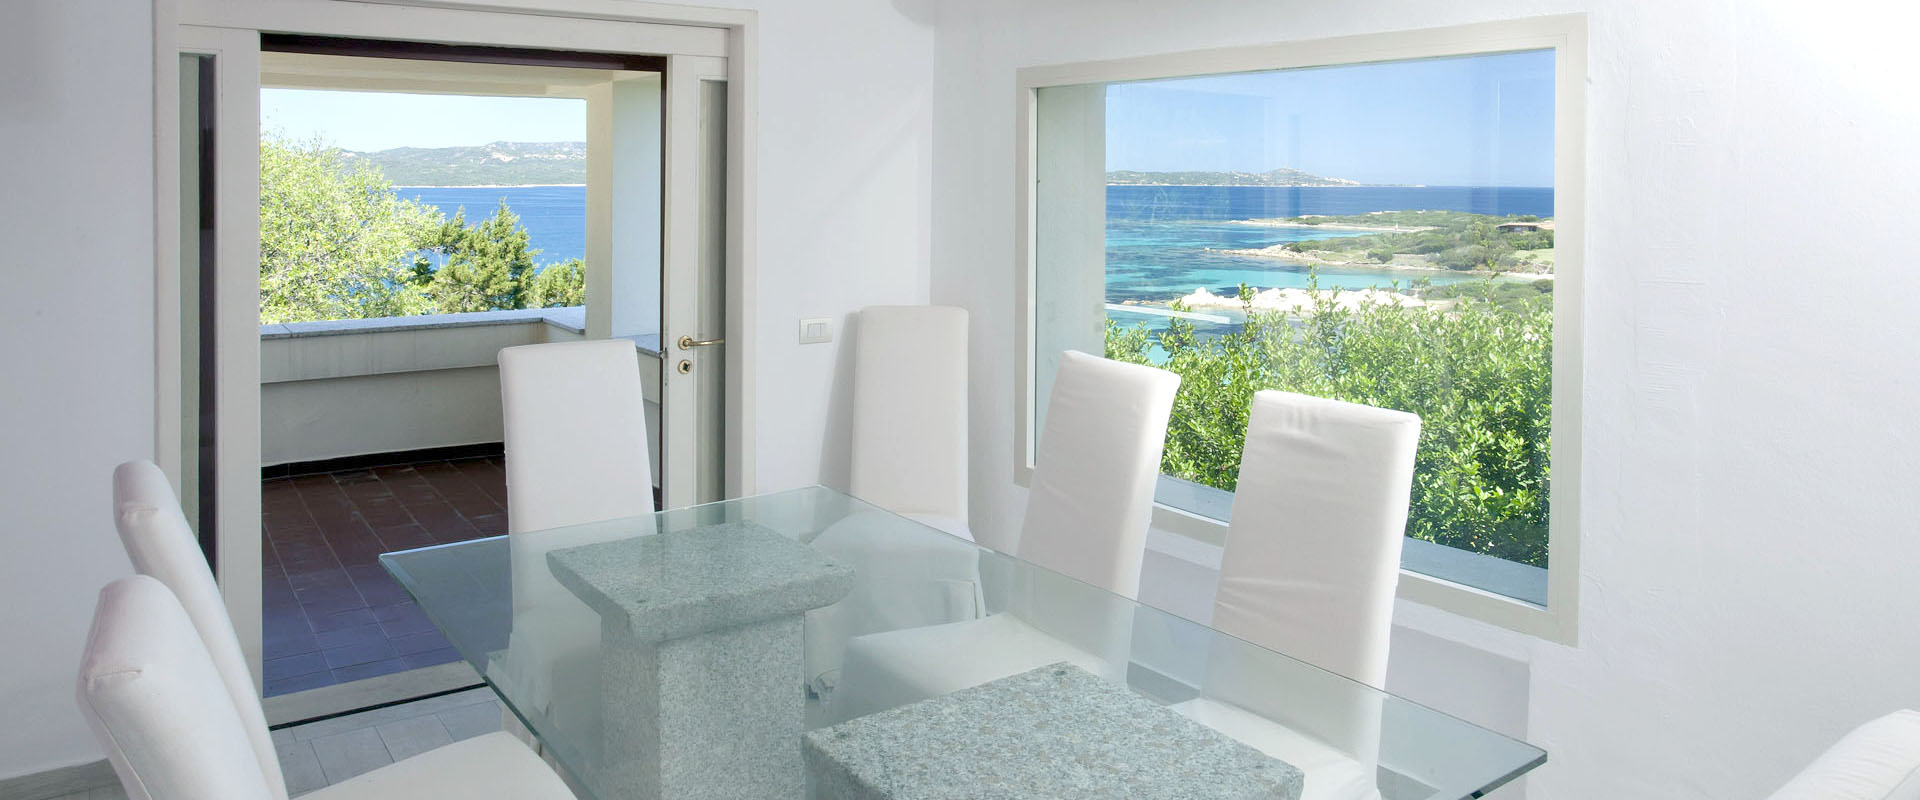 Luxury-Villa-WhiteBEach-Portorotondo-Sardinia-Rent8